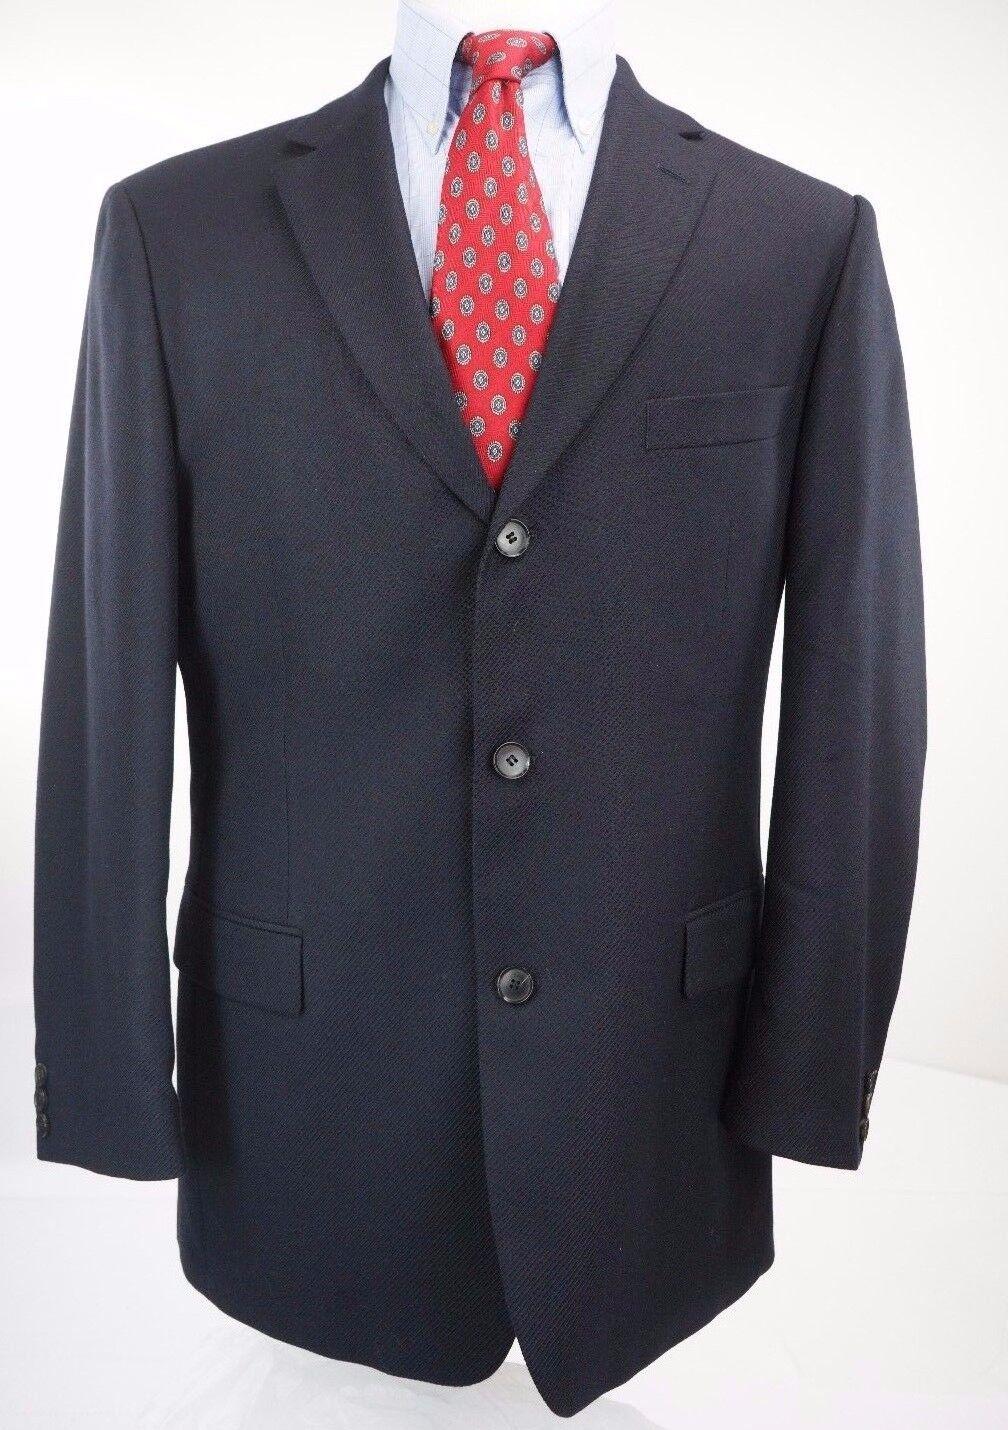 HUGO BOSS Scorsese Navy bluee 100% Wool Three Button Blazer Sport Coat 42 R